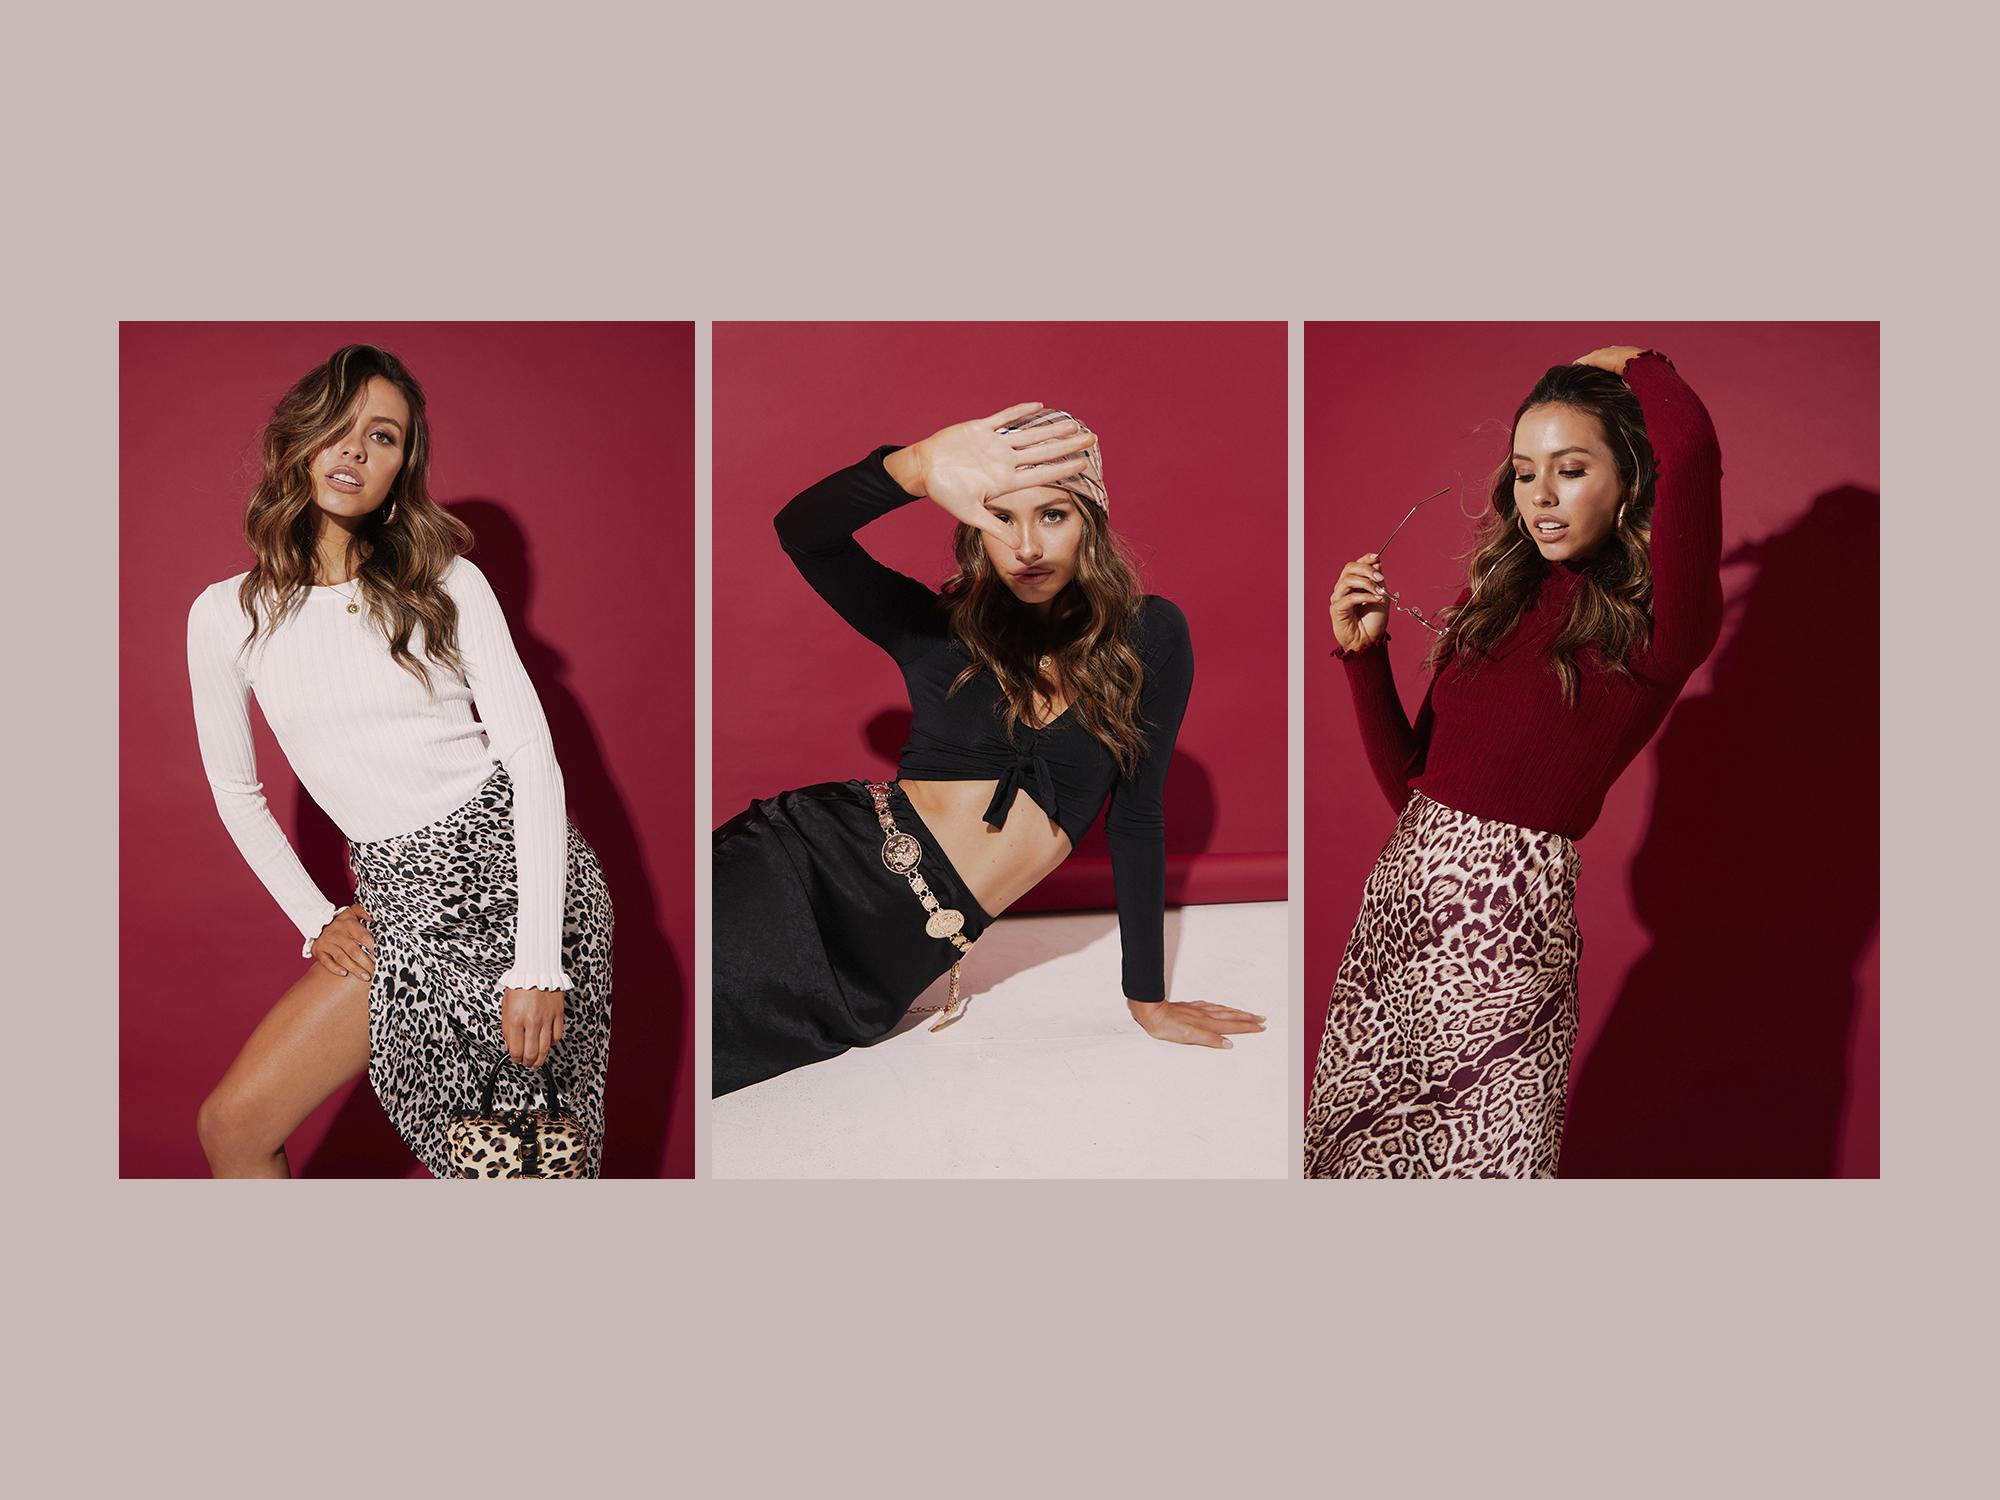 Rosey Hefner Skirt, Ami Miller Top and Abbico Box Bag; Verona Skirt, Foxy Kim Top, Sachi Chain Belt and Geofferson Satin Scarf; West Village Skirt and Phoenix Top